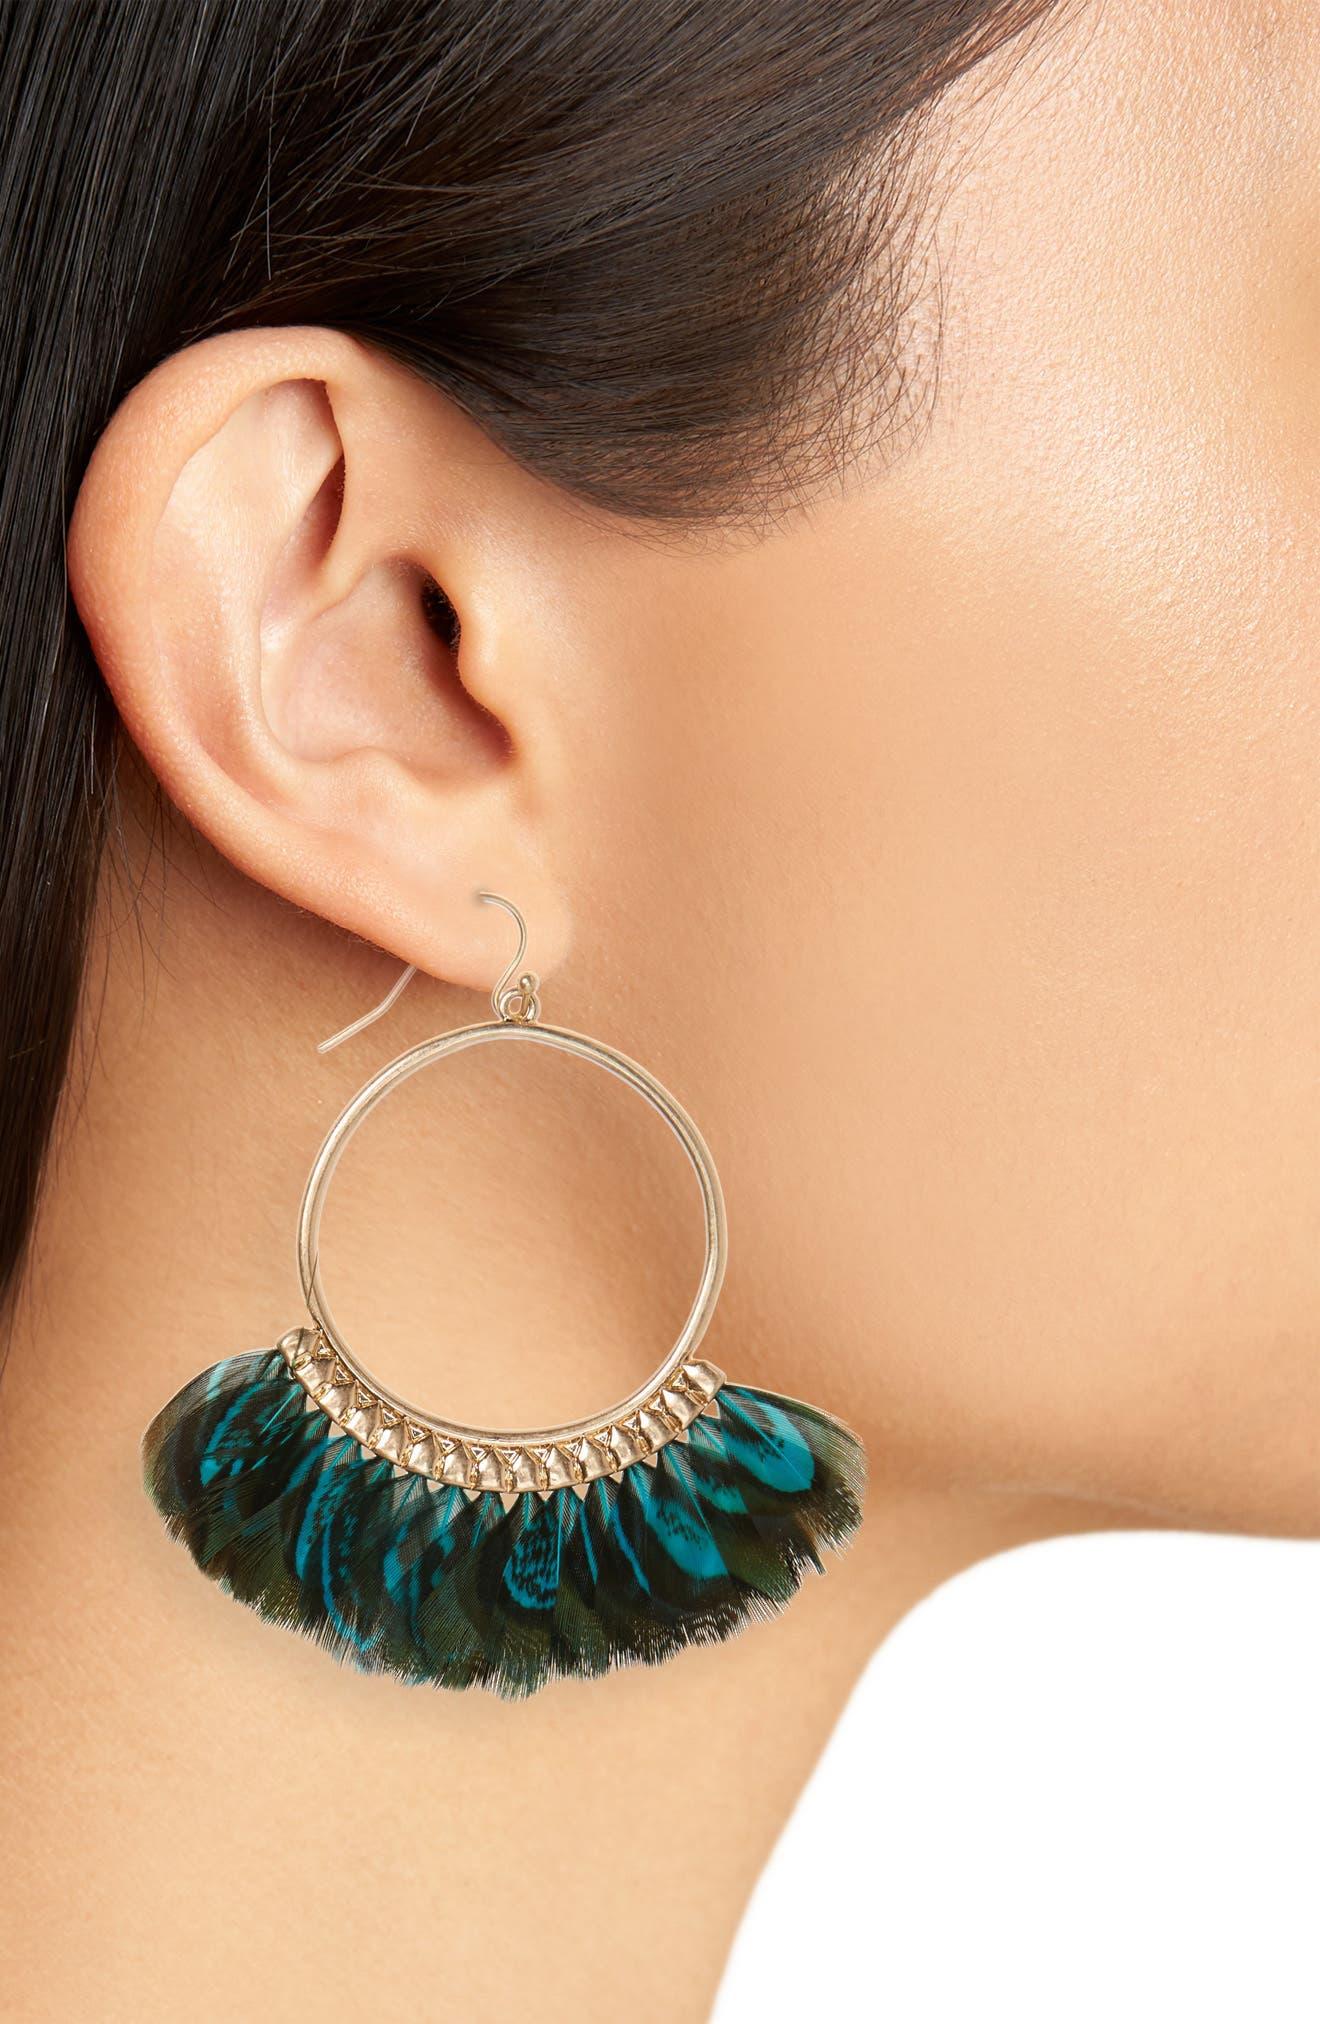 Feather Hoop Earrings,                             Alternate thumbnail 2, color,                             001